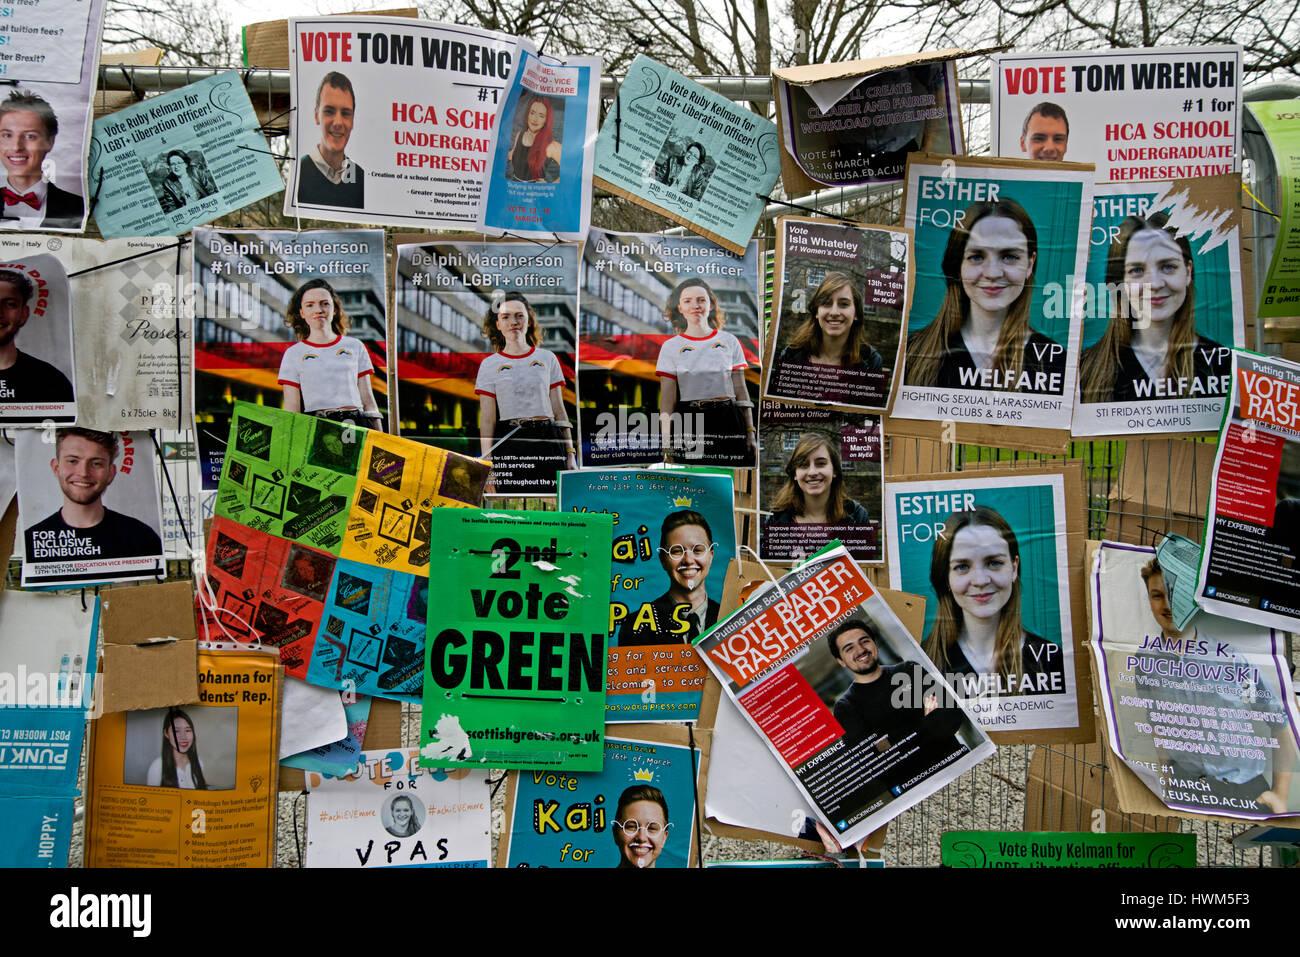 University of Edinburgh student election posters. - Stock Image